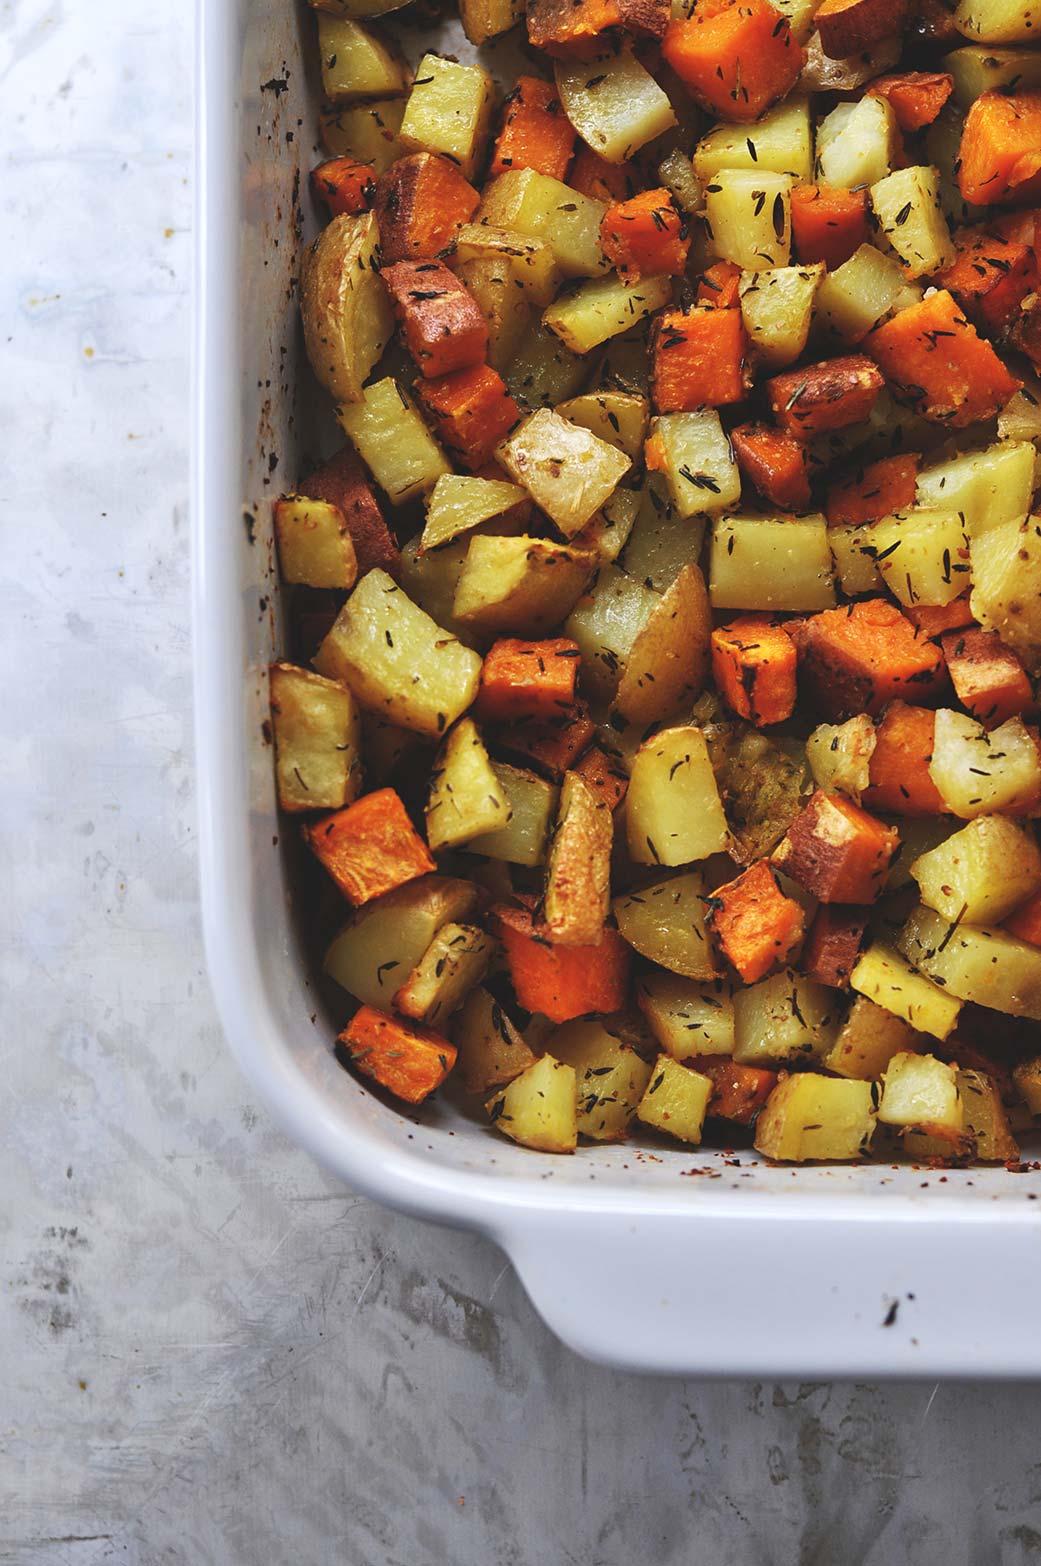 batatas fritas bajas en calorias horno